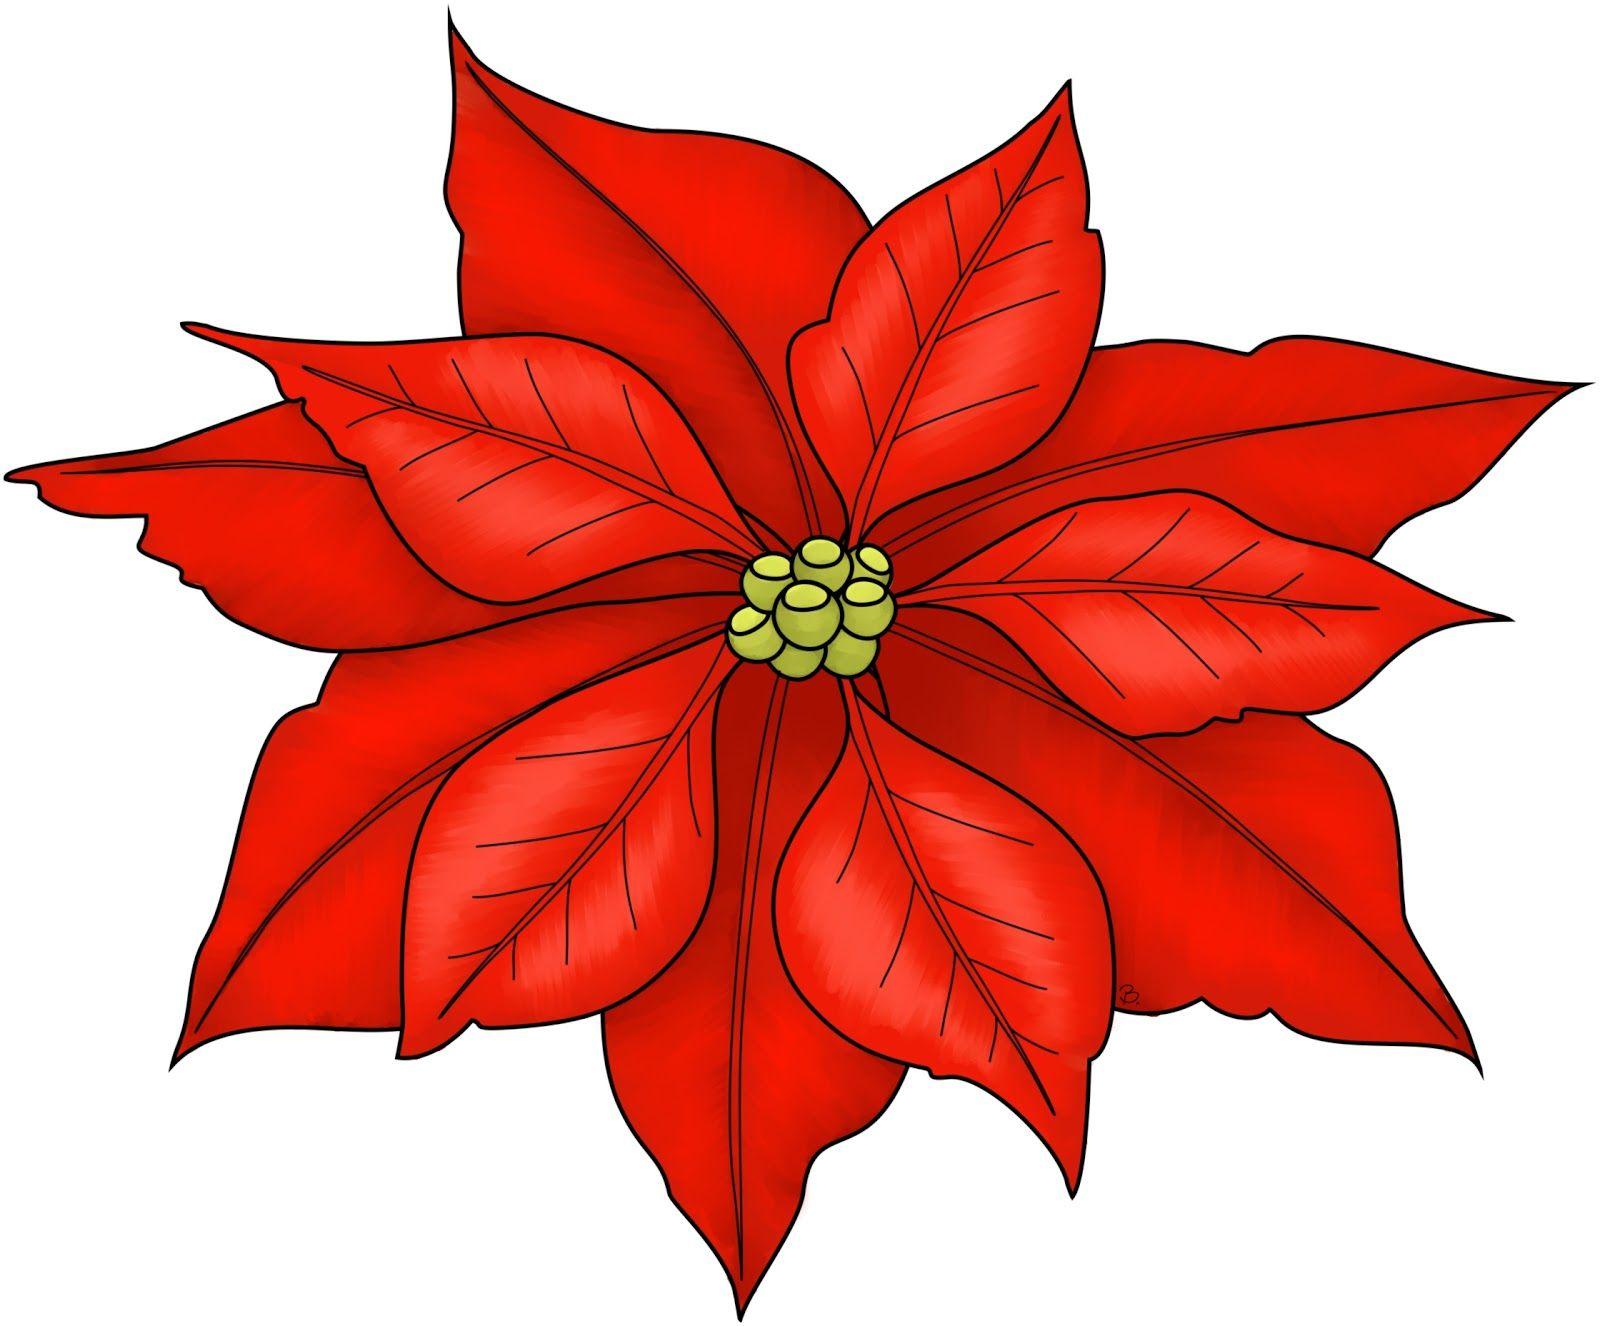 Poinsettia freebie printable would. Poinsettias clipart holiday